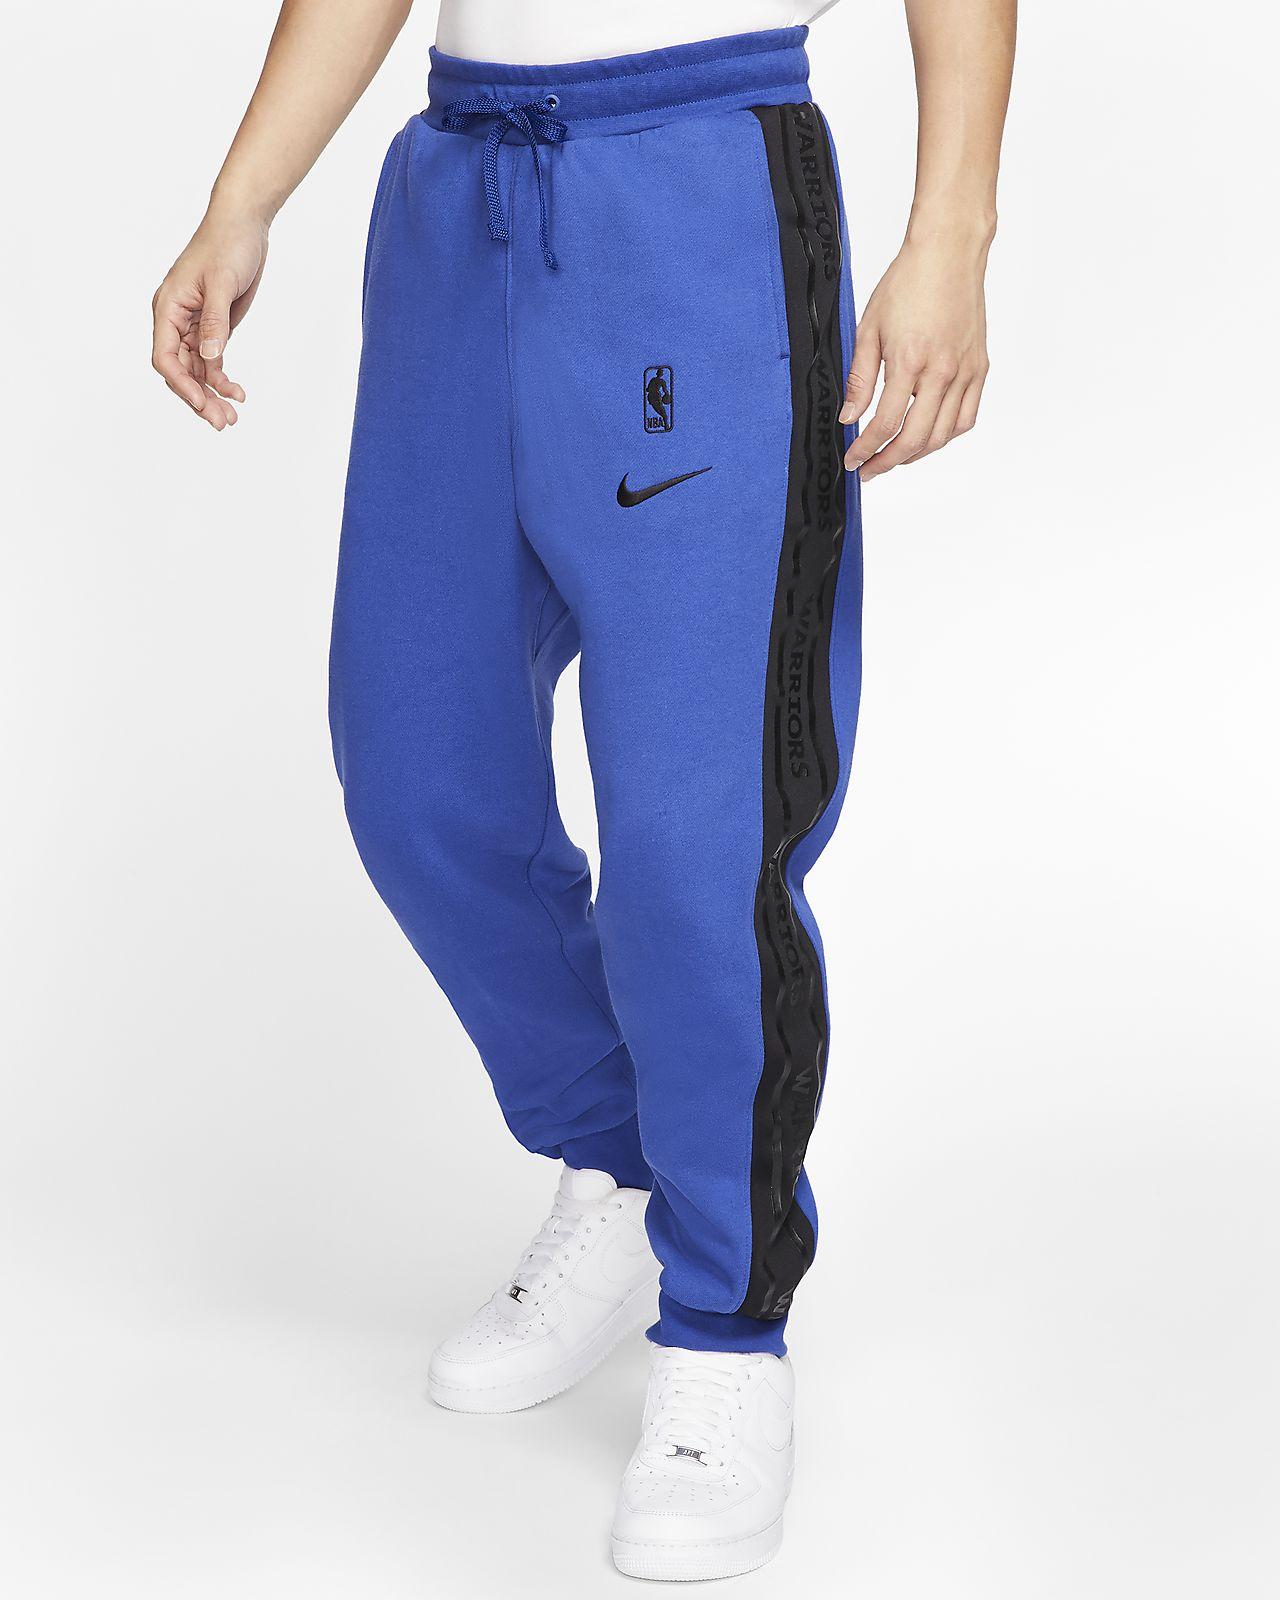 Golden State Warriors Nike Men's NBA Trousers